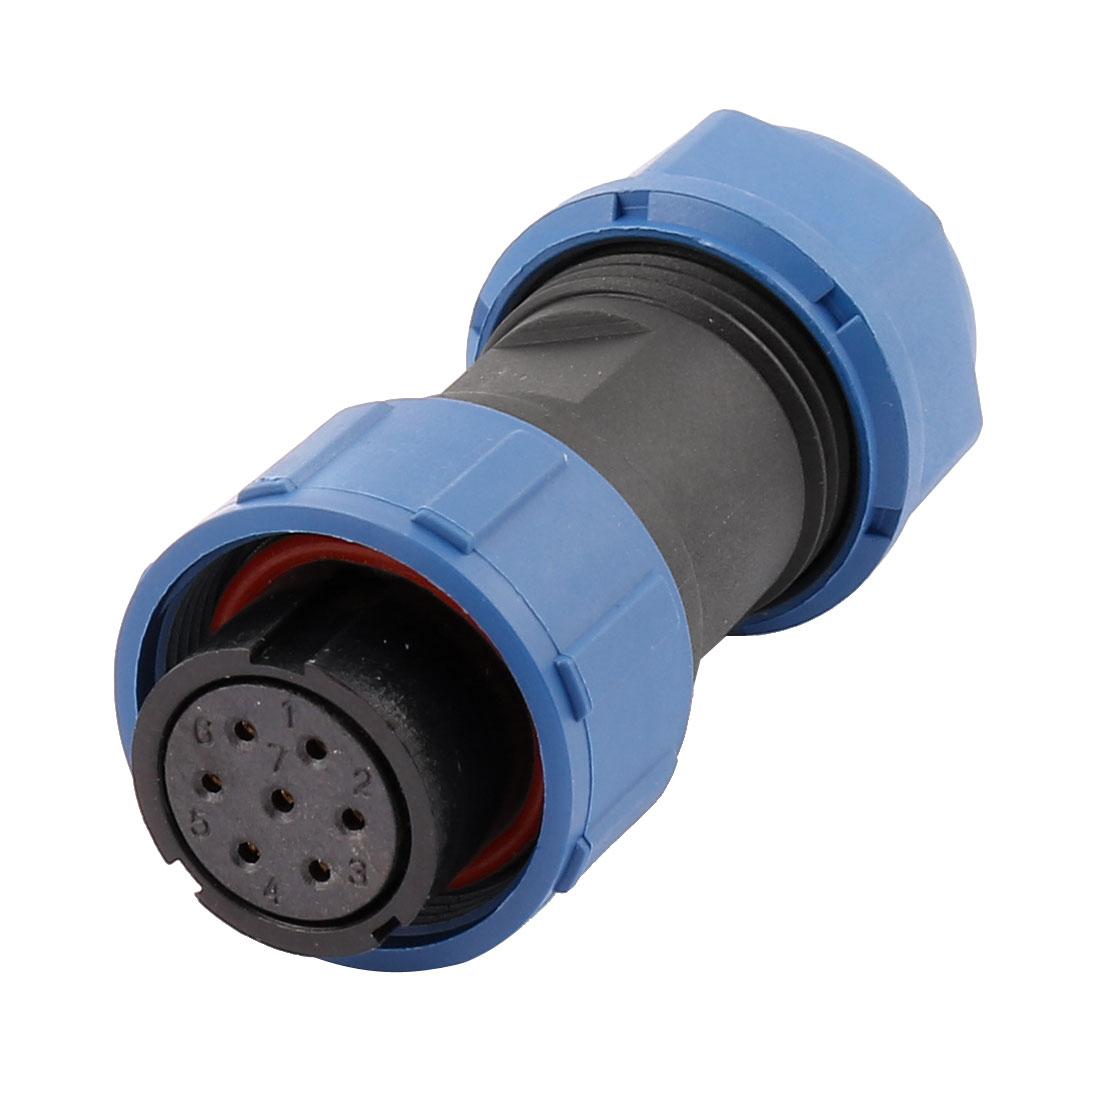 AC 500V 7 Poles SP1710/S Waterproof Aviation Socket Dustproof Adapter Connector